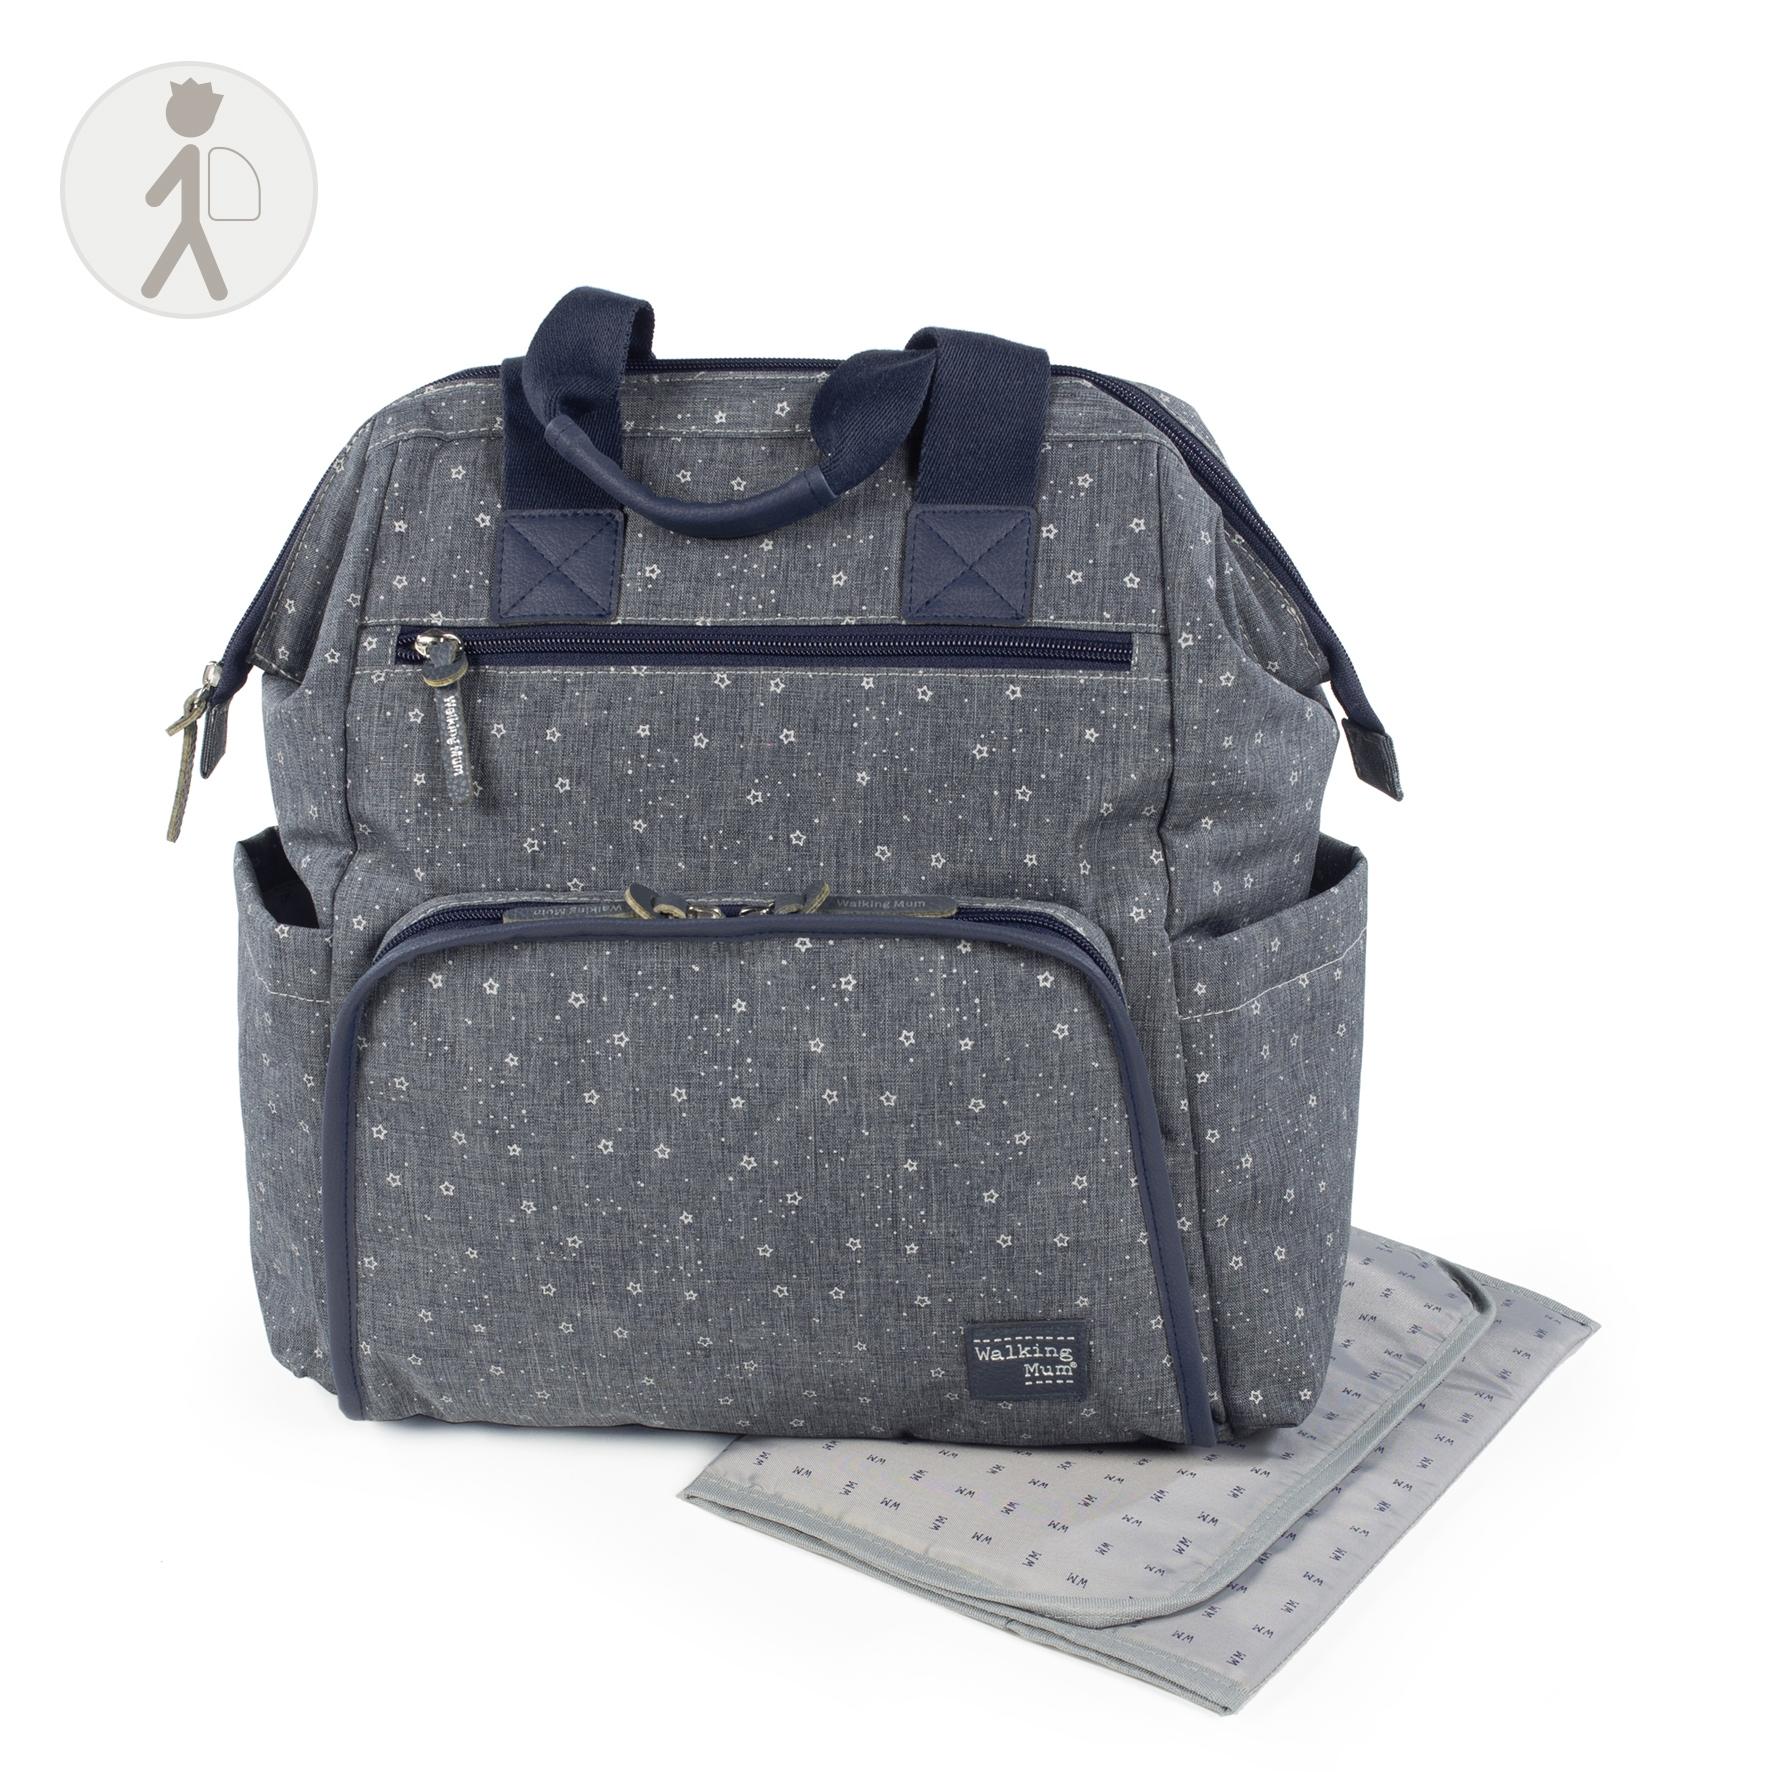 Bolso mochila para silla Dreamer azul de Walking Mum